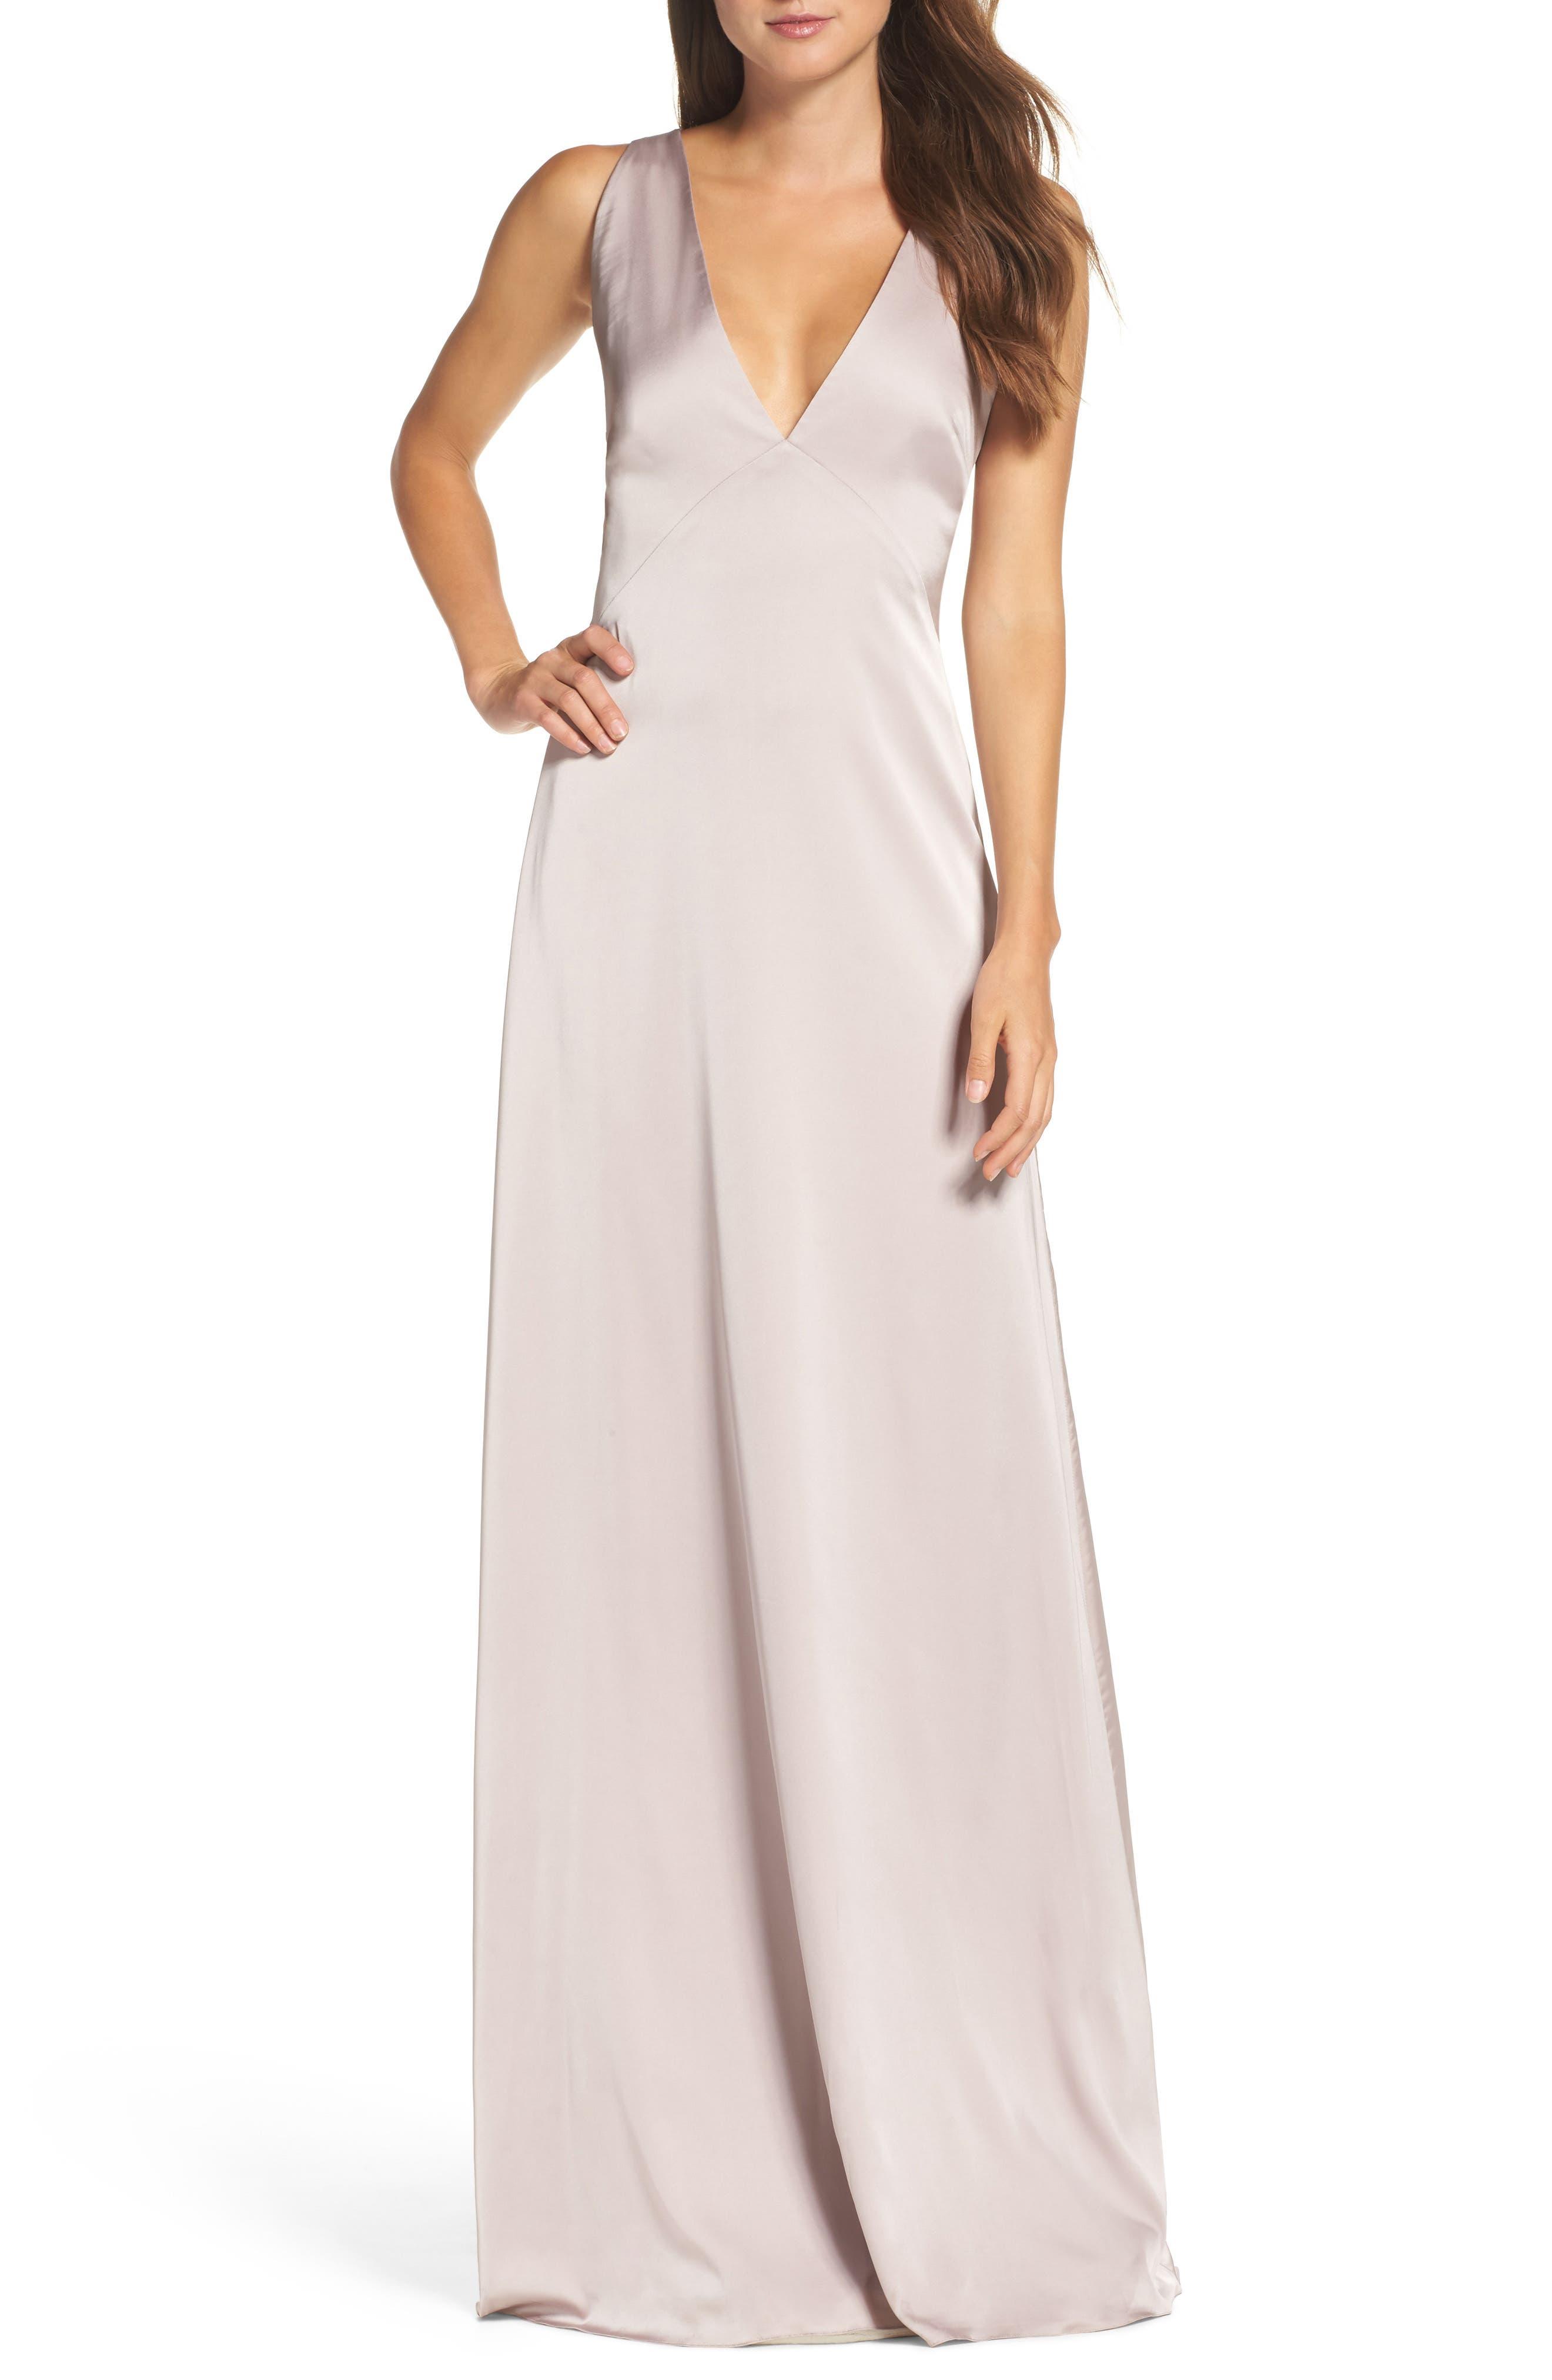 Monique Lhuillier Bridesmaids Dasha Tie Back Sateen Gown (Nordstrom Exclusive)